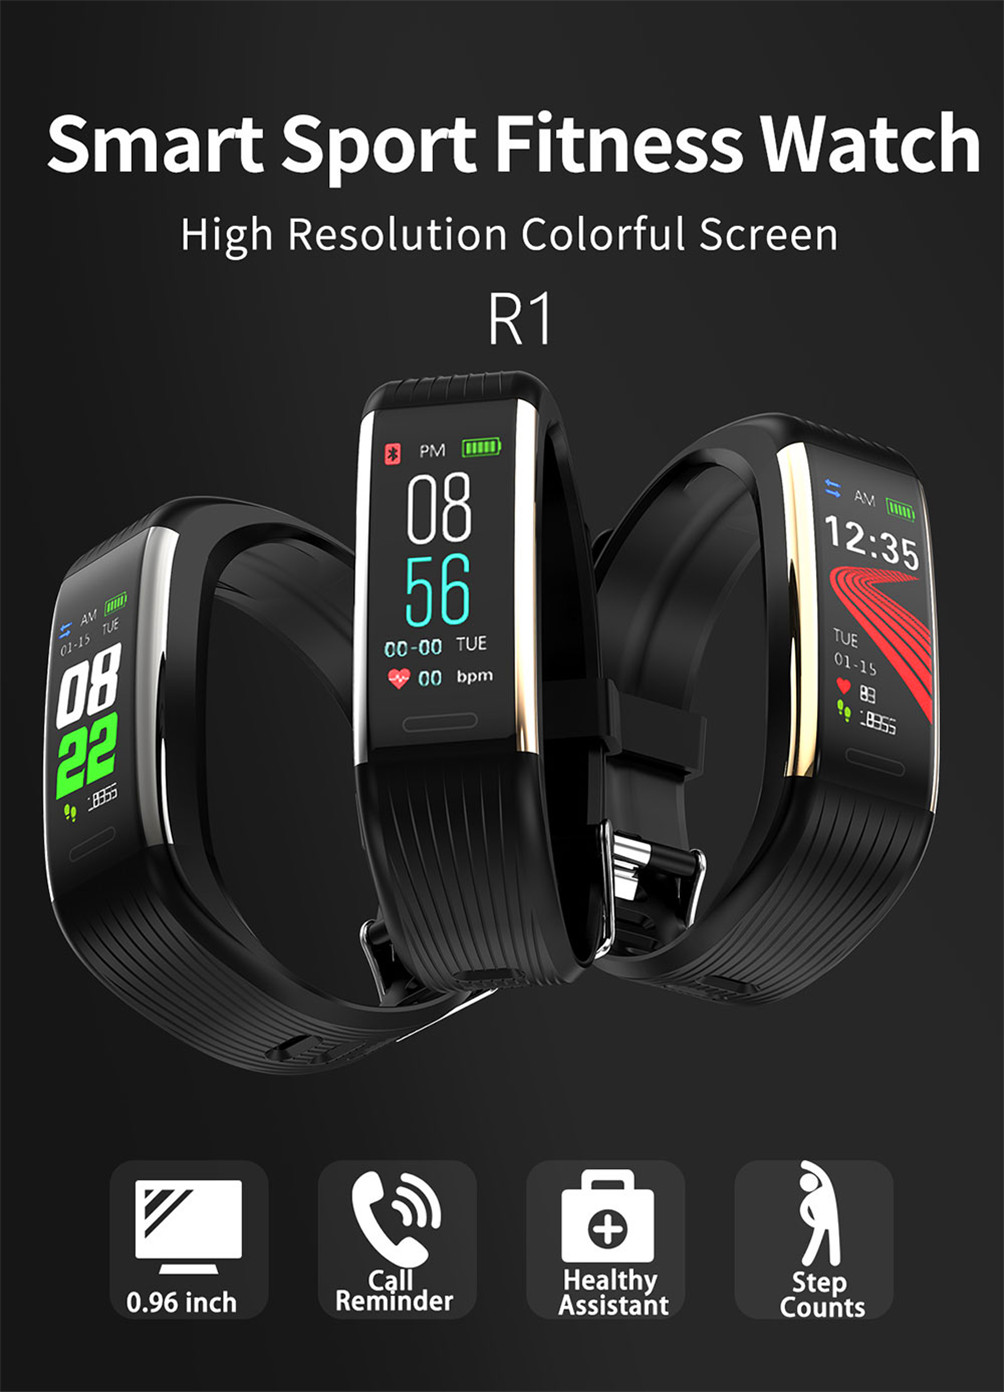 Hd46729efcacd420d9600237111646c70W 2020 Smart Wristband Fitness Bracelet Blood Pressure Measurement Smart Bracelet Heart Rate Waterproof Pedometer Smart Band Watch